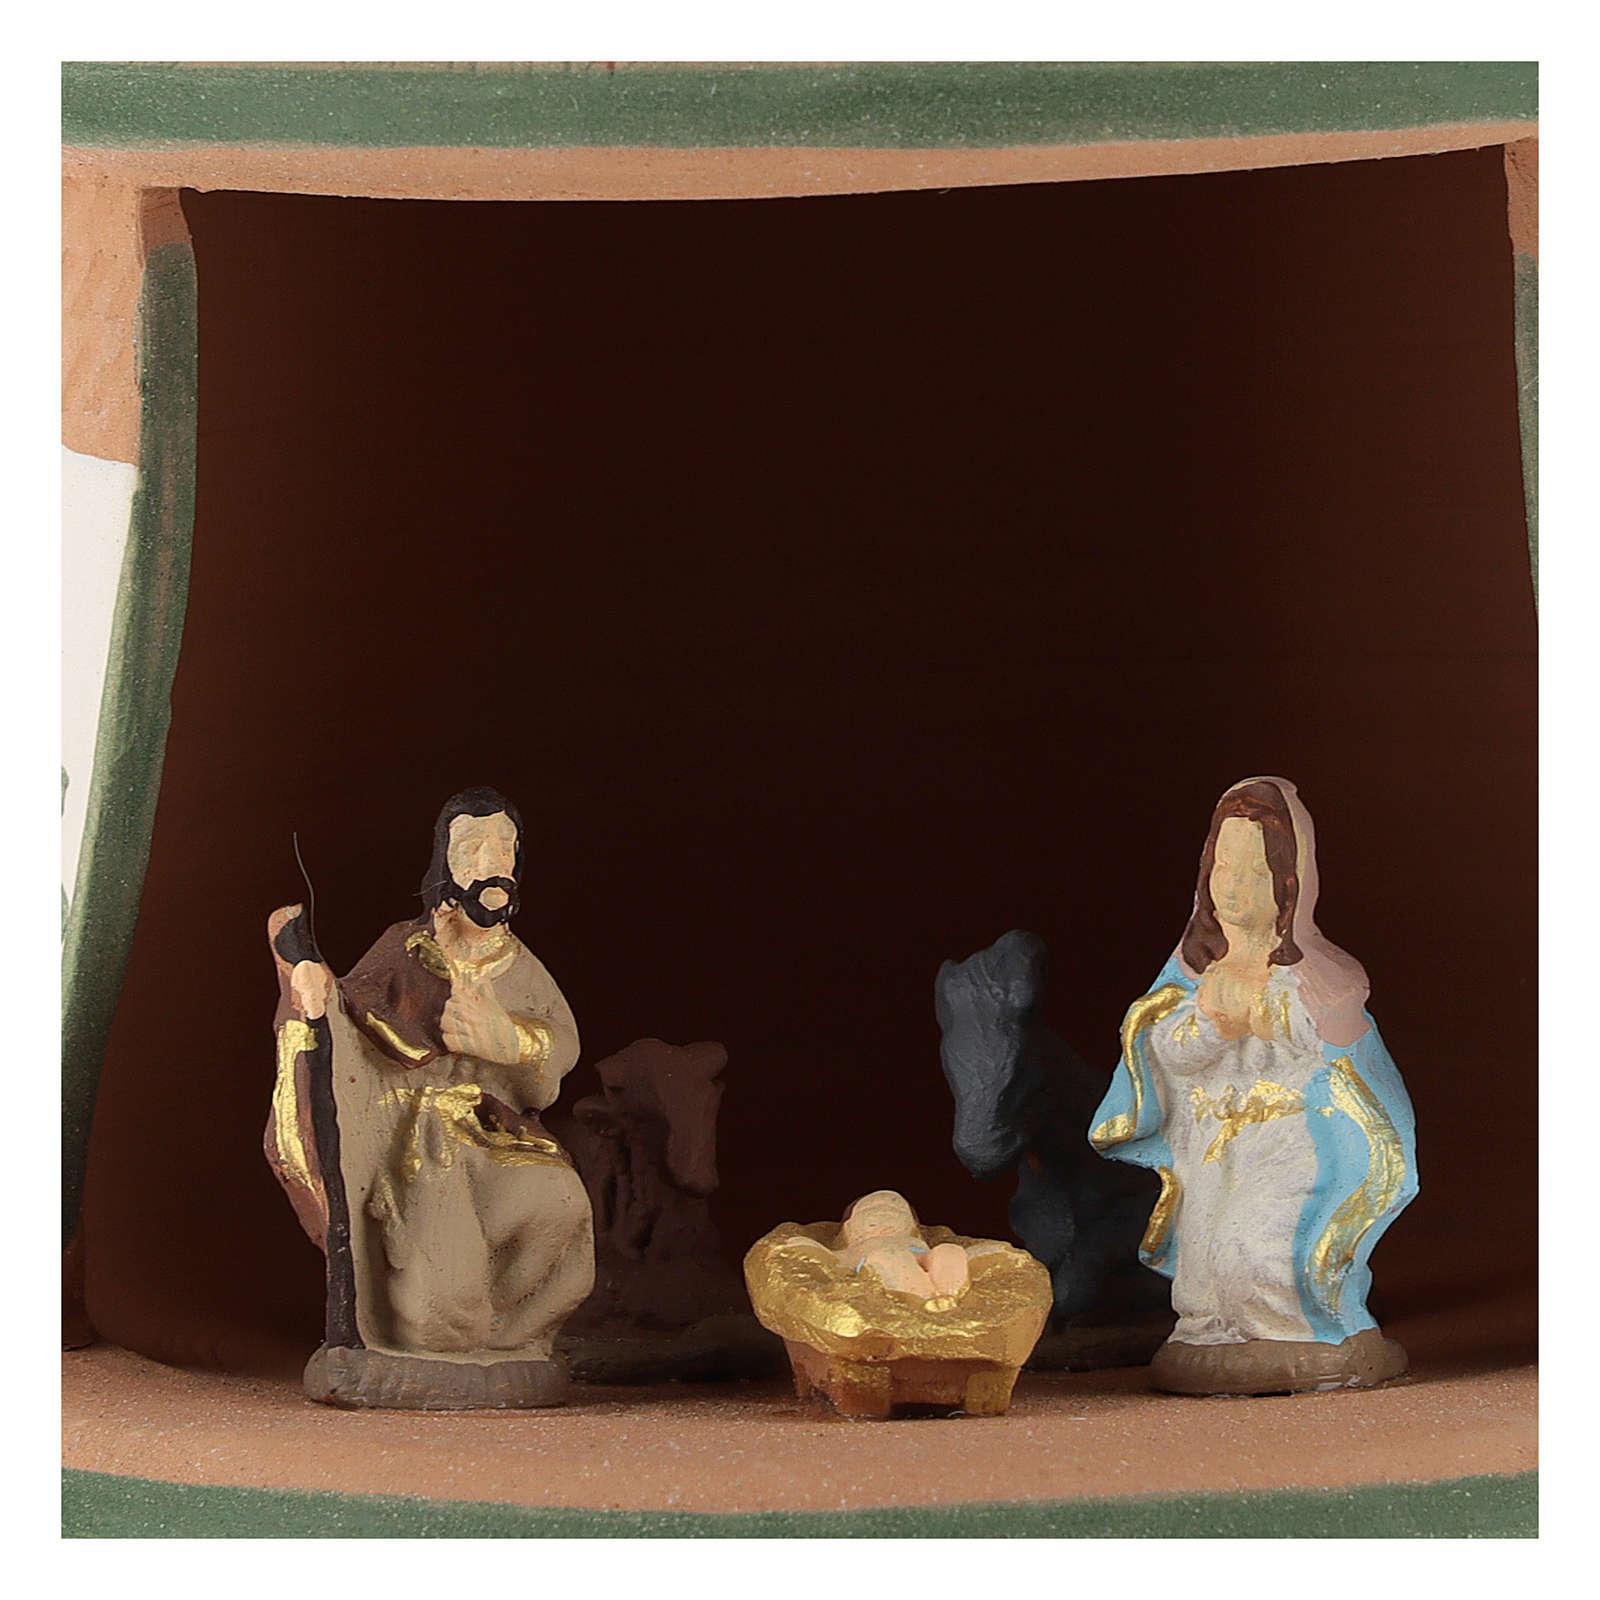 Capanna ceramica natività 4 cm colorata country verde 15x10x10 cm Deruta 4